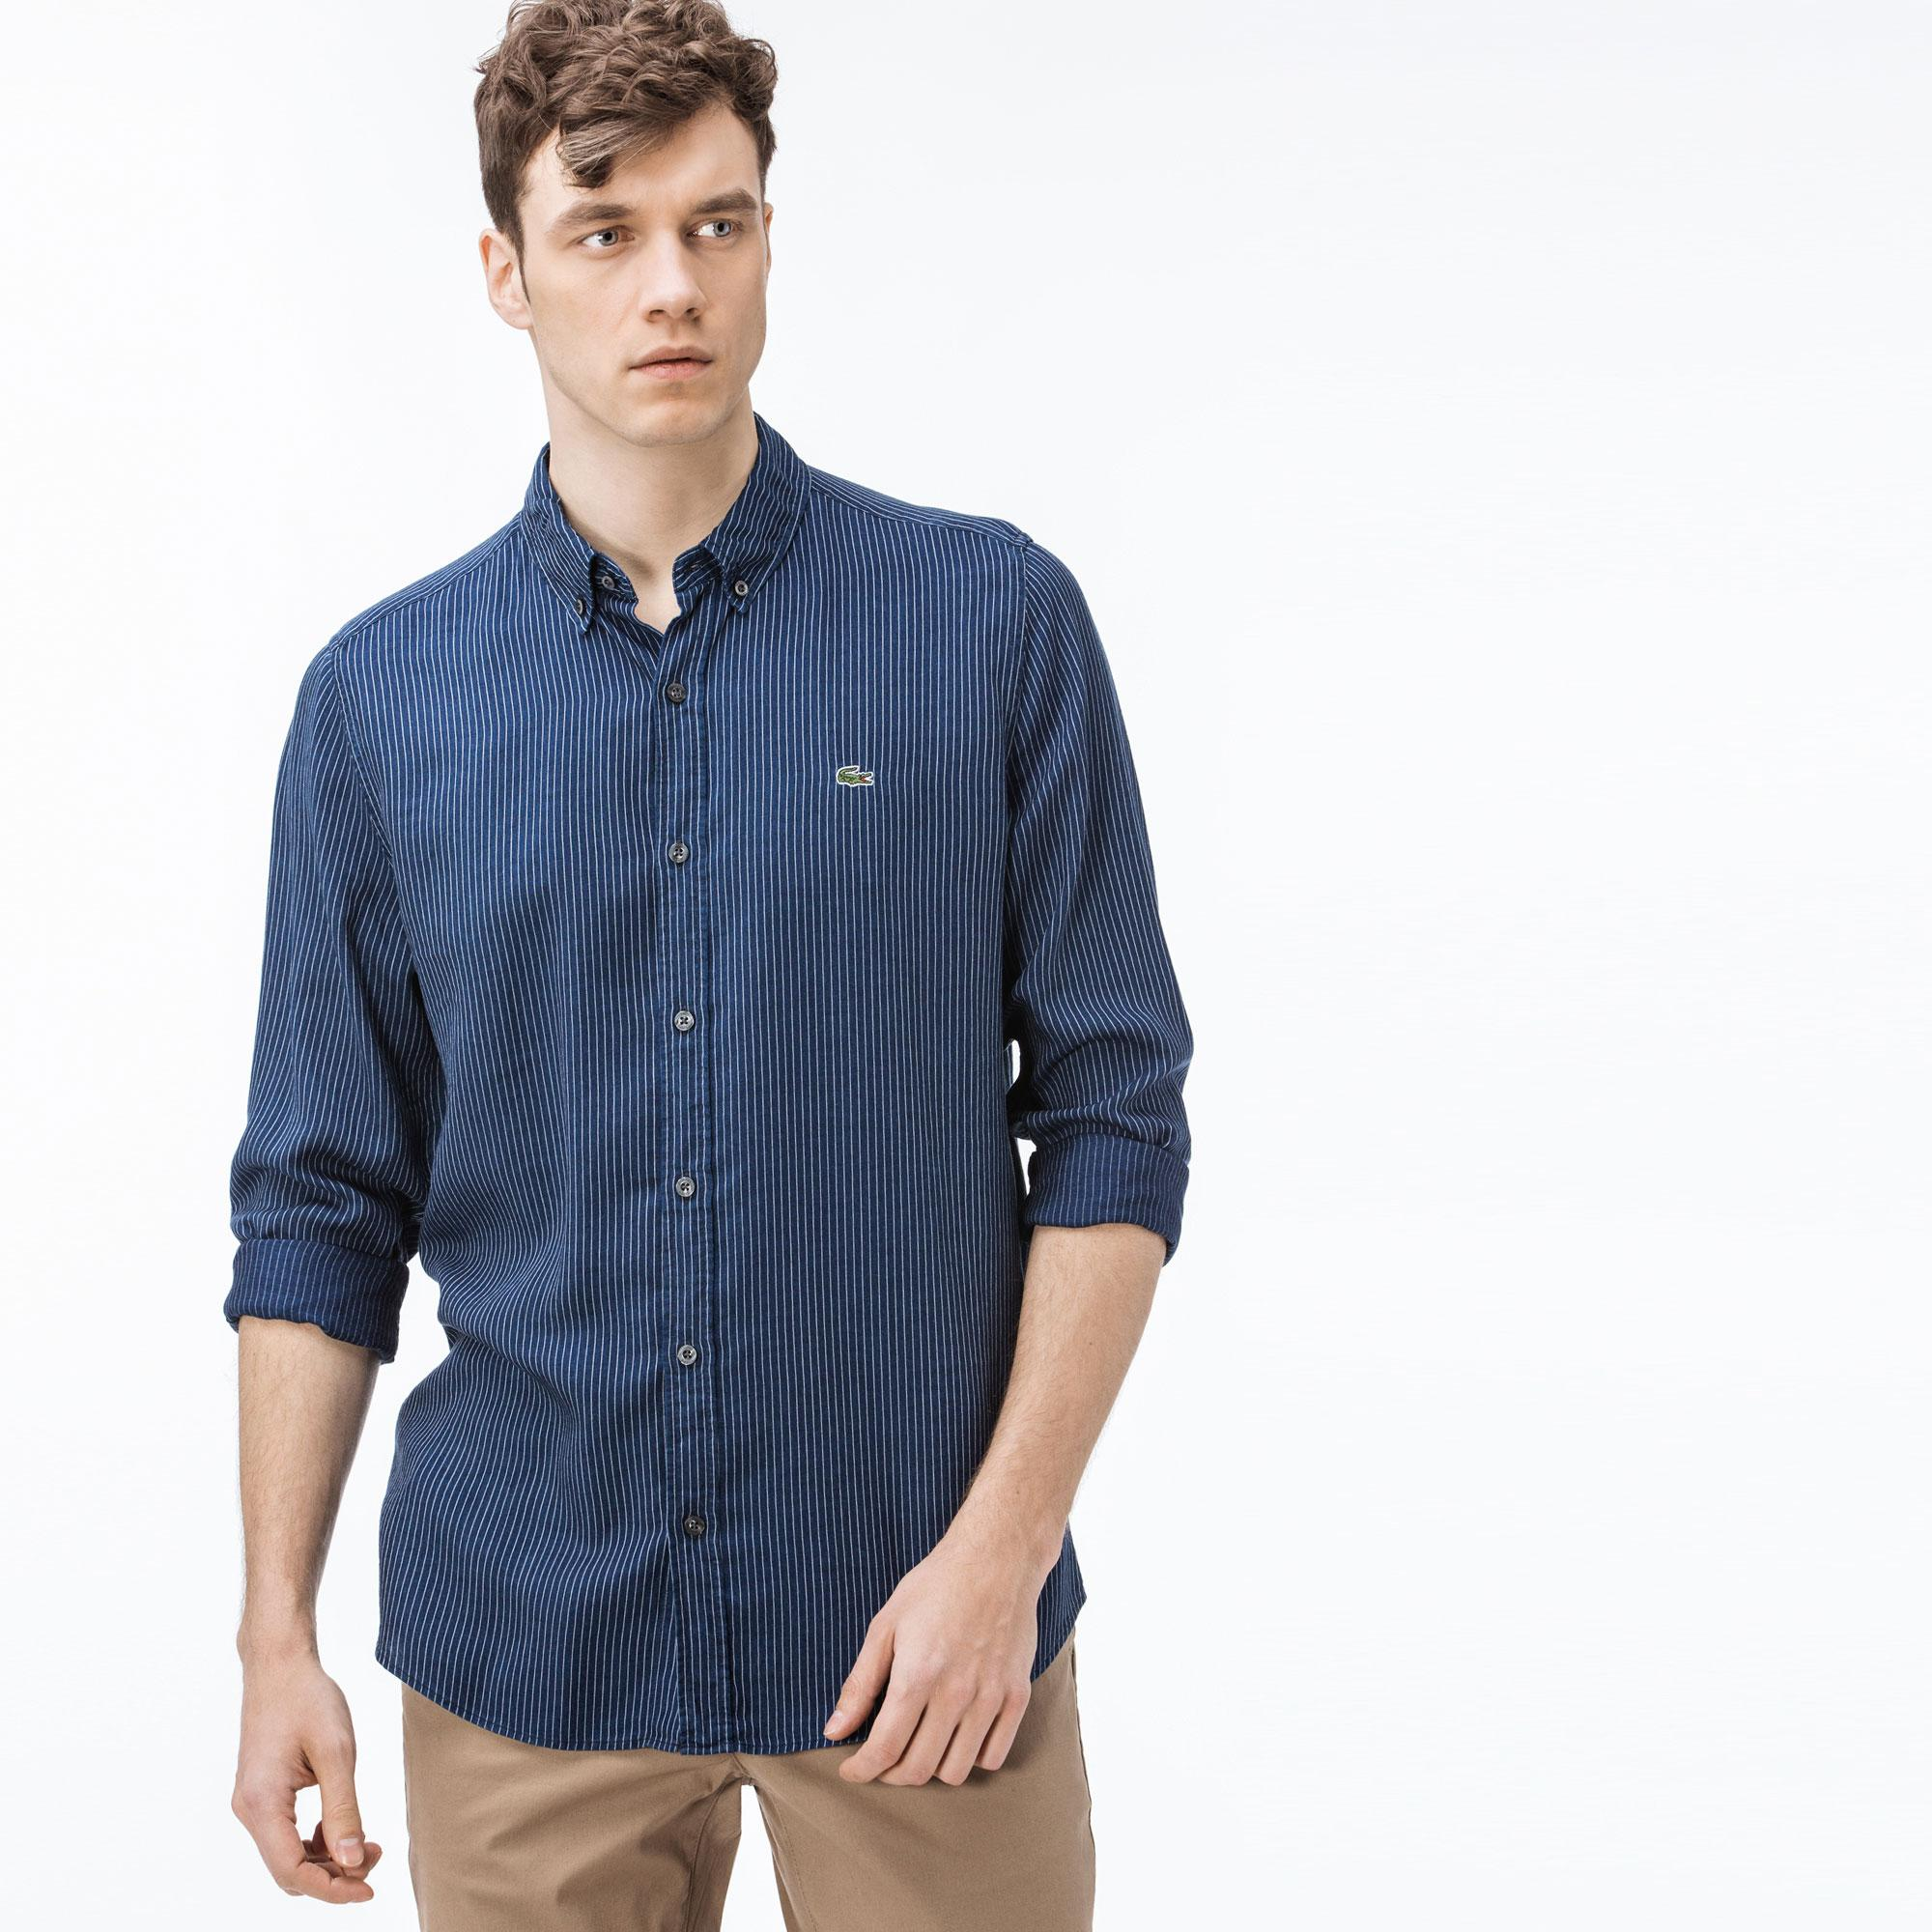 Lacoste Erkek Slim Fit Çizgili Lacivert Gömlek